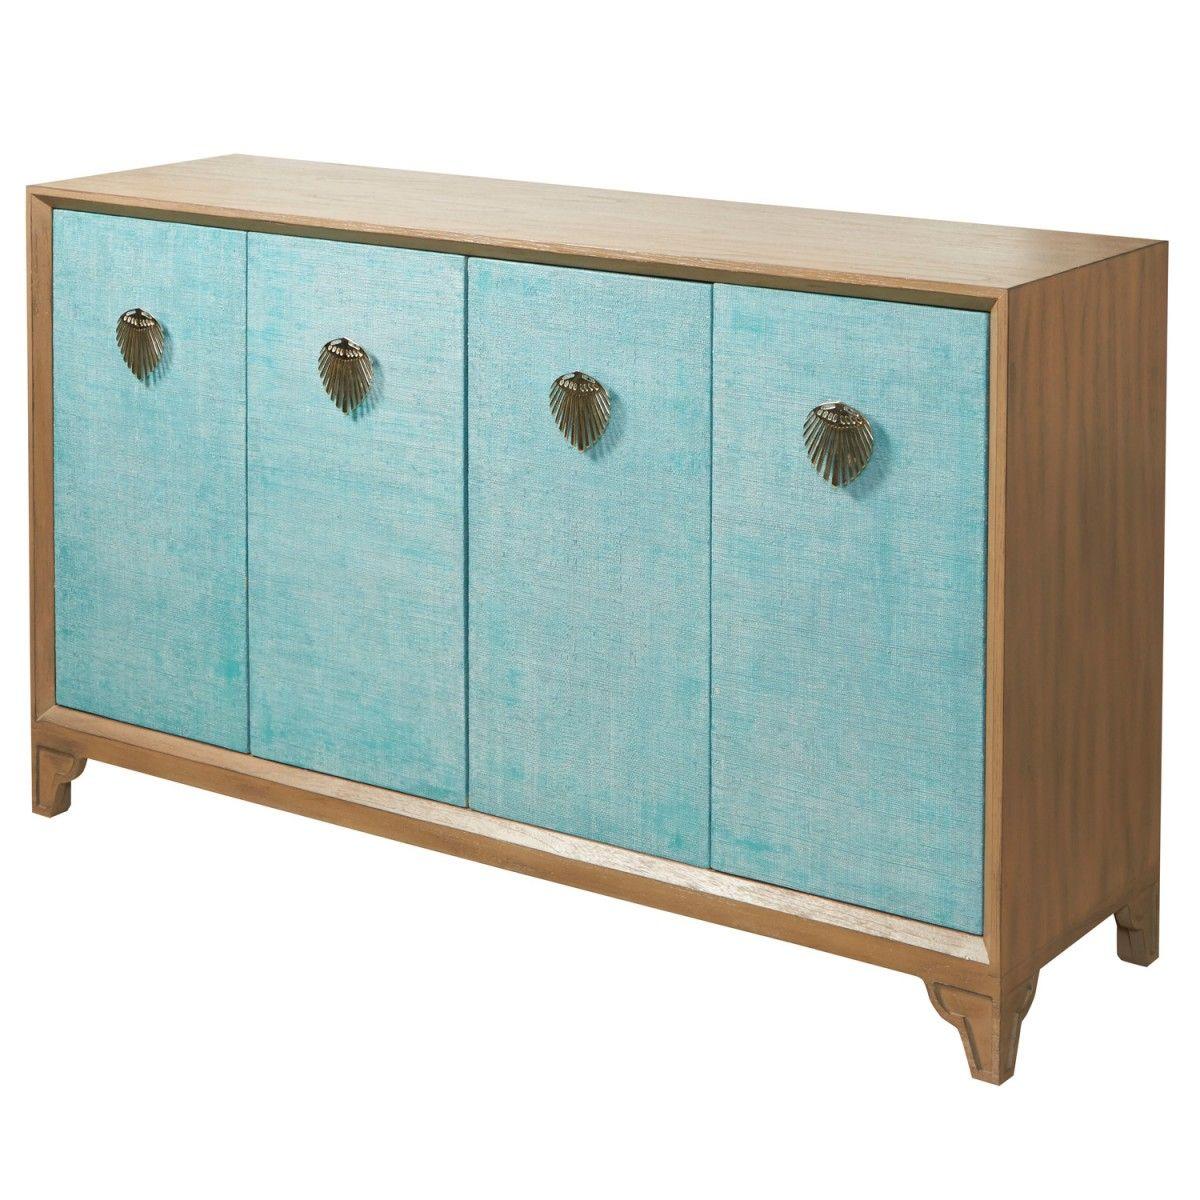 Charming Selamat Florence Broadhurst Shanghai Credenza   Jade   Buffets, Cabinets U0026  Sideboards   Dining Room